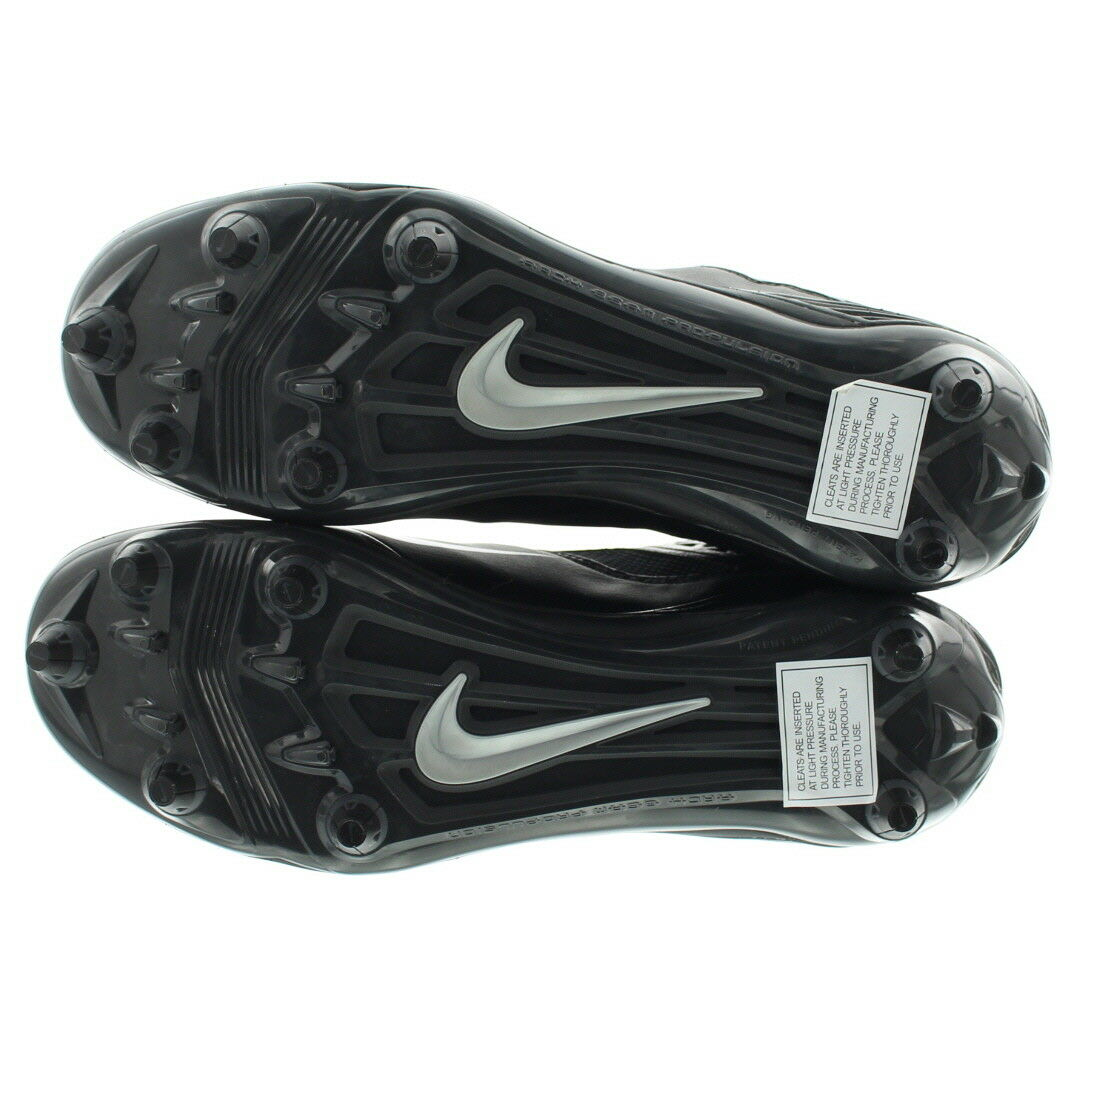 quality design 80a59 108d5 ... Nike 579668 Mens Lunar Lunar Lunar Code Pro 3 4 Mid Top Football  Lacrosse Cleats